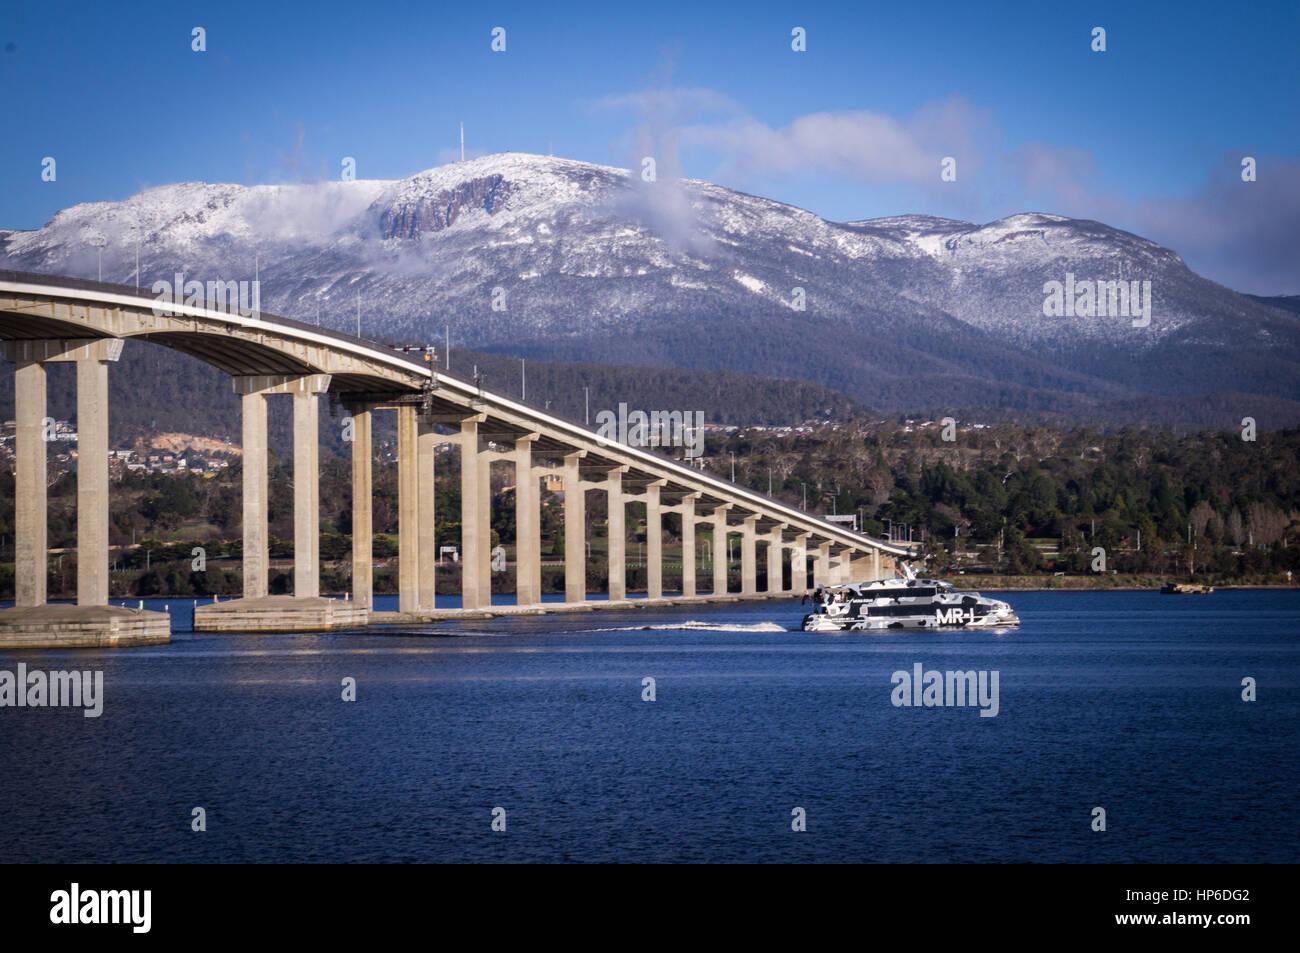 Mt Wellington and Tasman bridge view from Rose Bay, Hobart, Tasmania, Australia - Stock Image